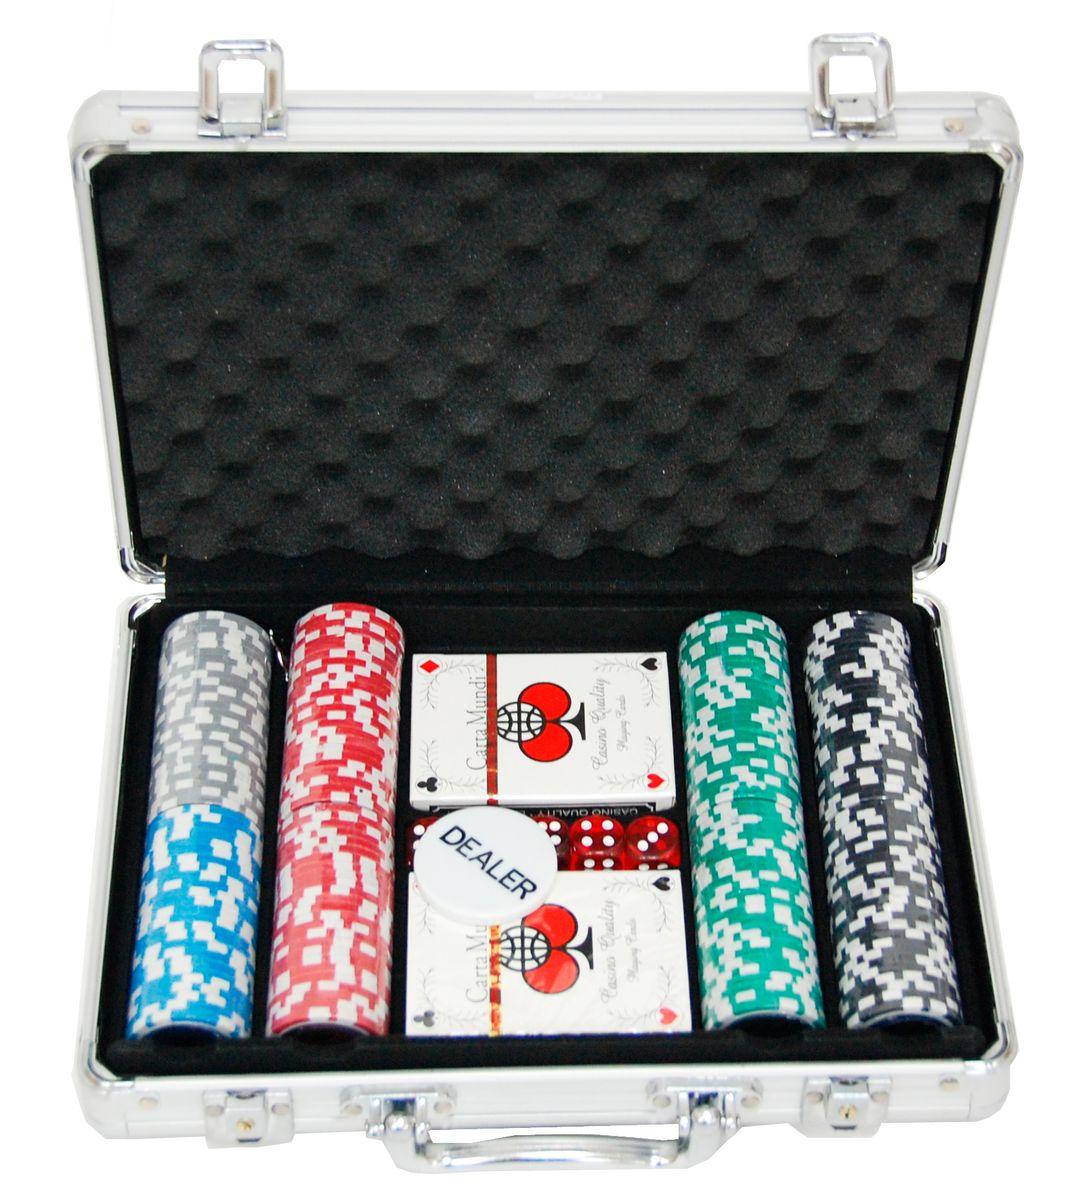 Дипломат для покера на 200 фишек с номиналом, размер: 30х21х8см. ГД5/200ГД5/200Дипломат для покера на 200 фишек с номиналом